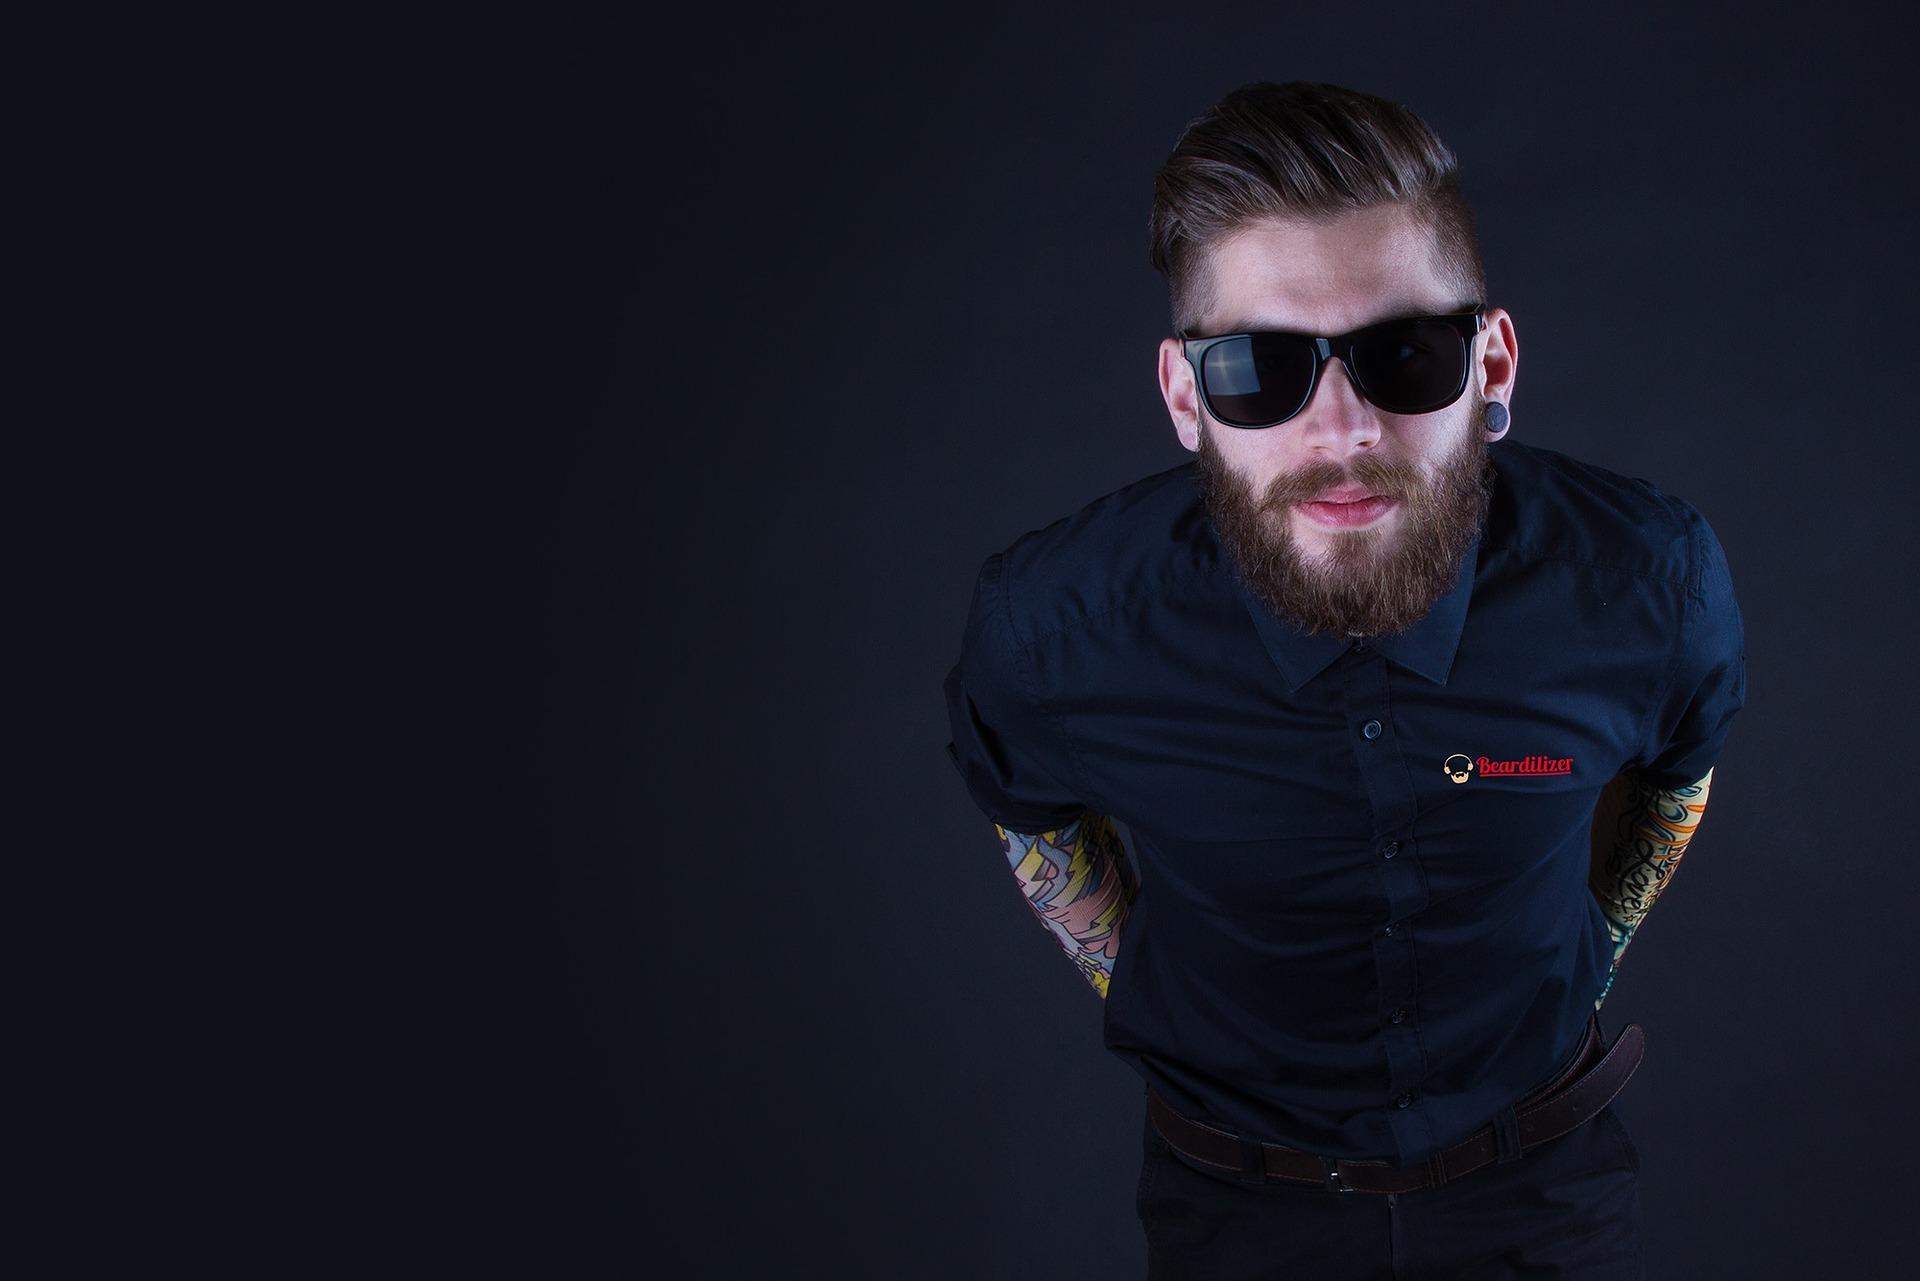 Got me a Beard: Die 10 Gebarte für echte Kerle